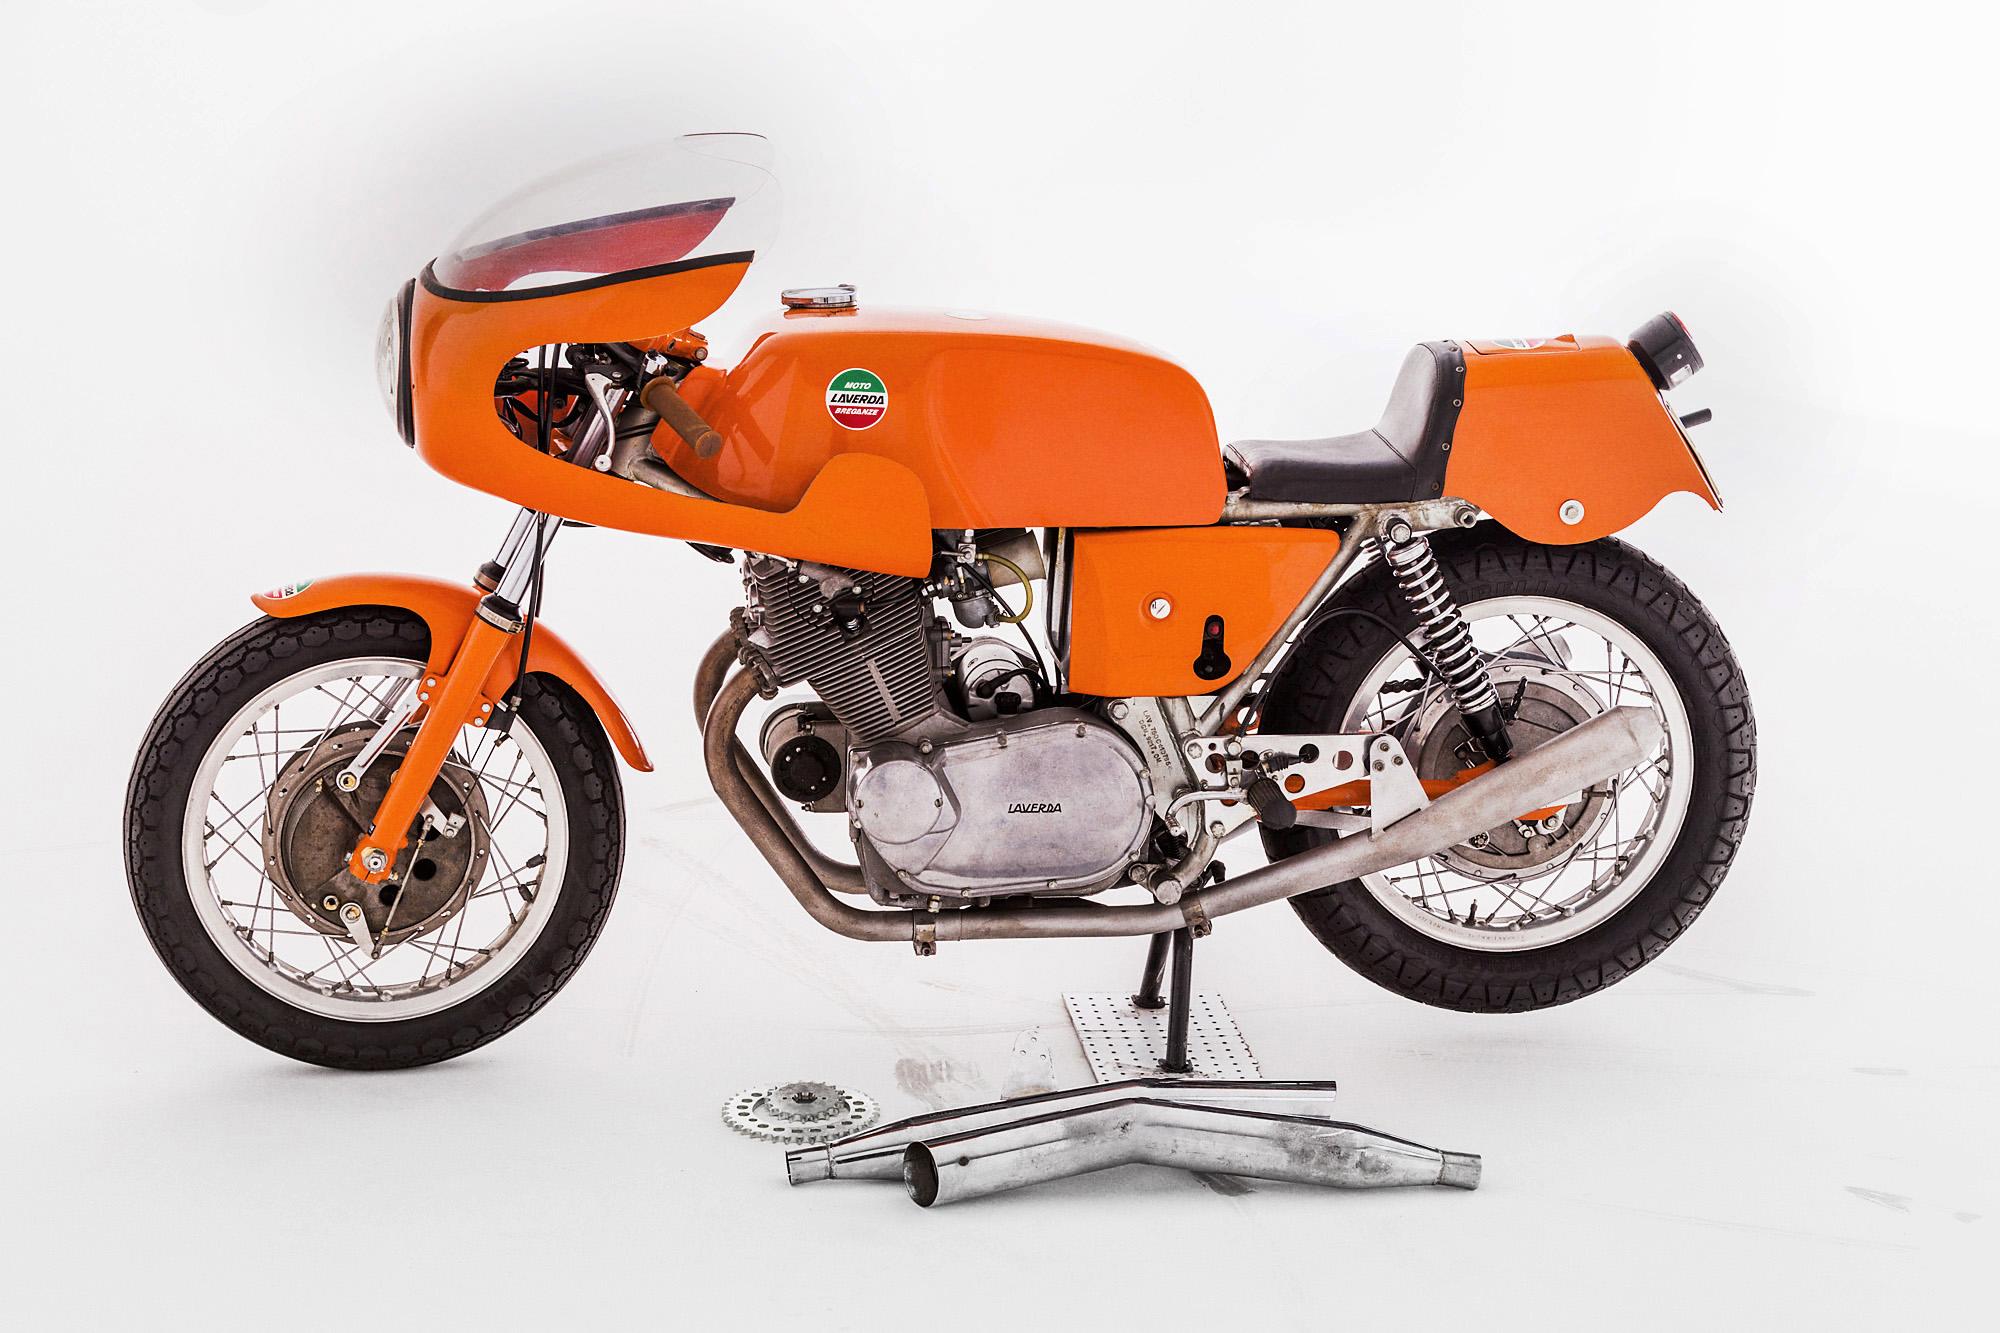 laverda sfc 1972 extra exhaust